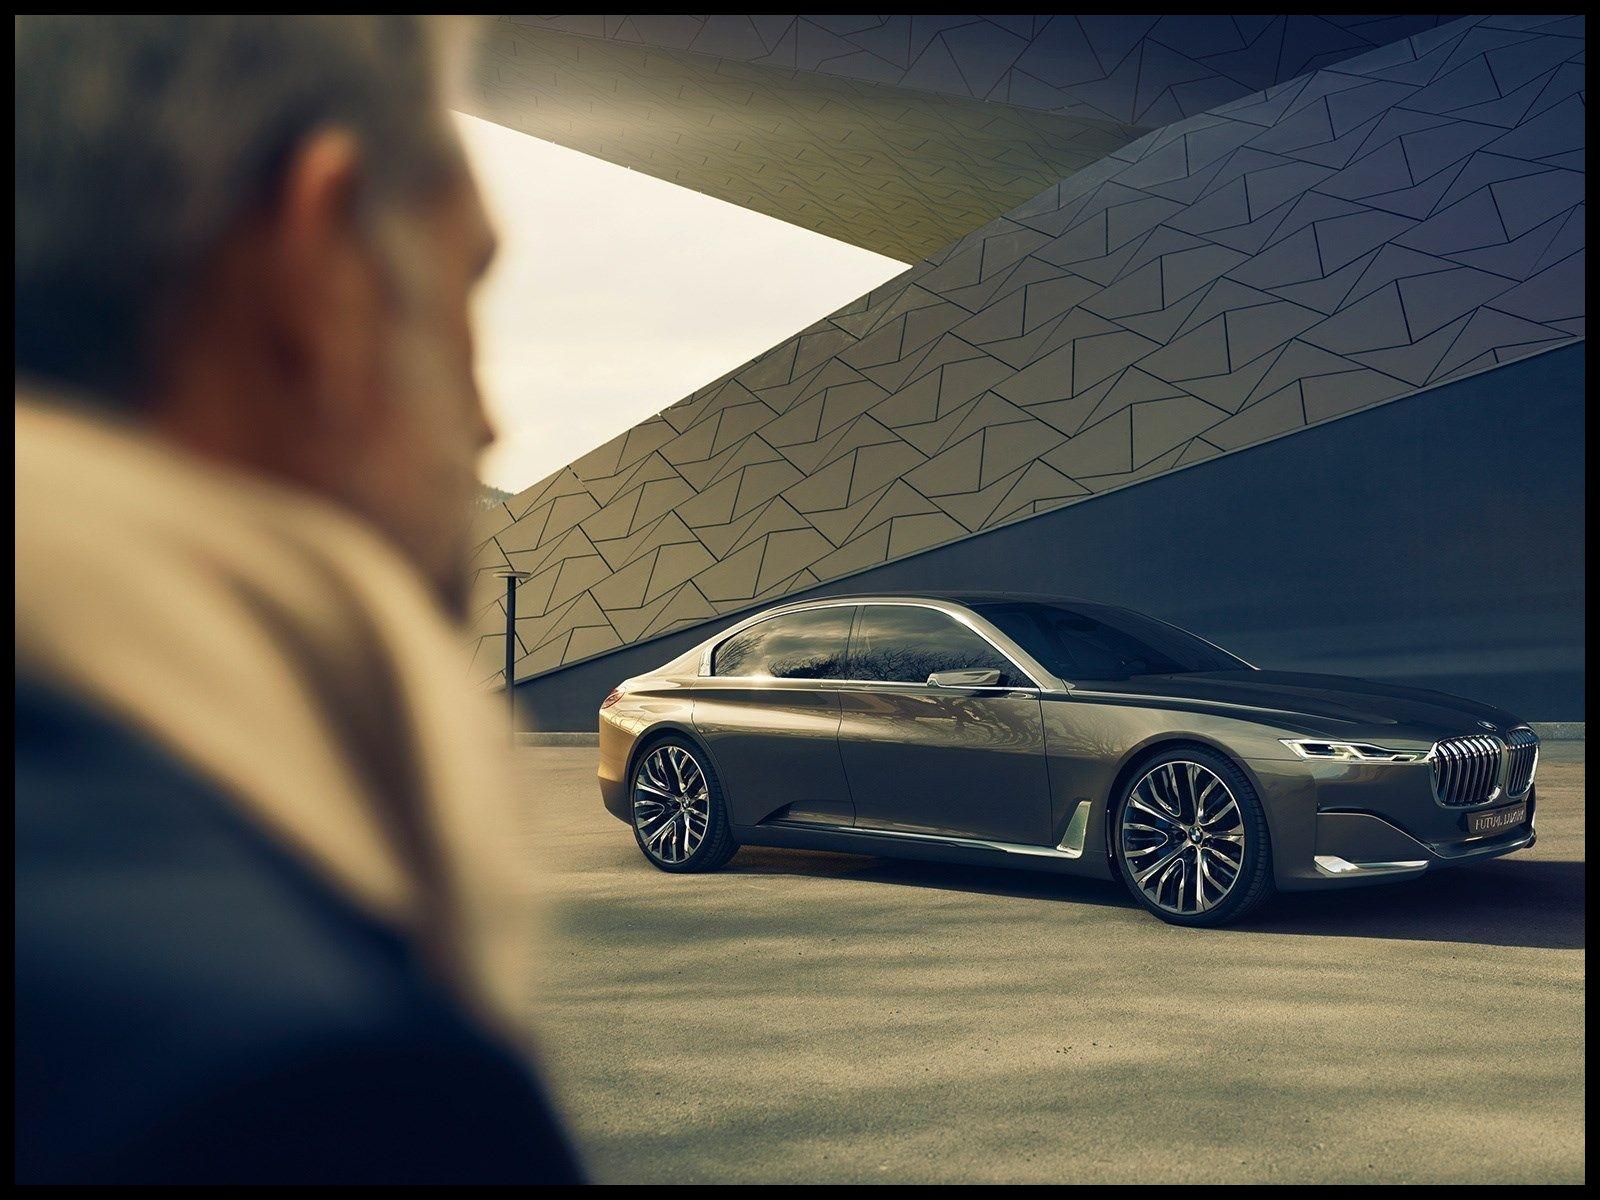 Car Image High Quality Fresh High Quality Bmw Vision Future Luxury High Quality Bmw Concept Wallpaper